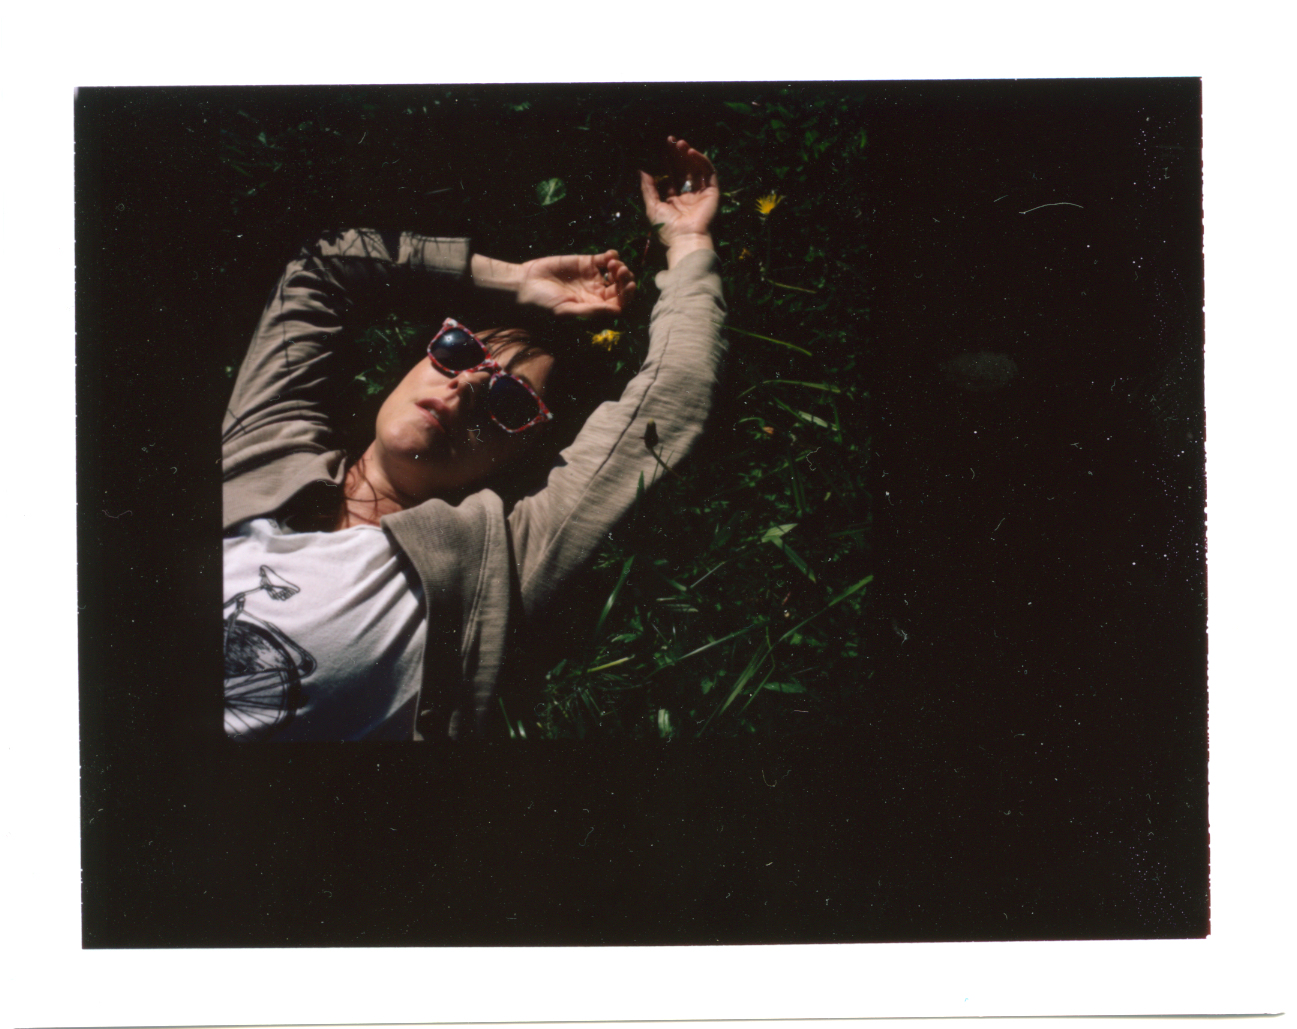 miller-portrait-polaroid-editorial-4